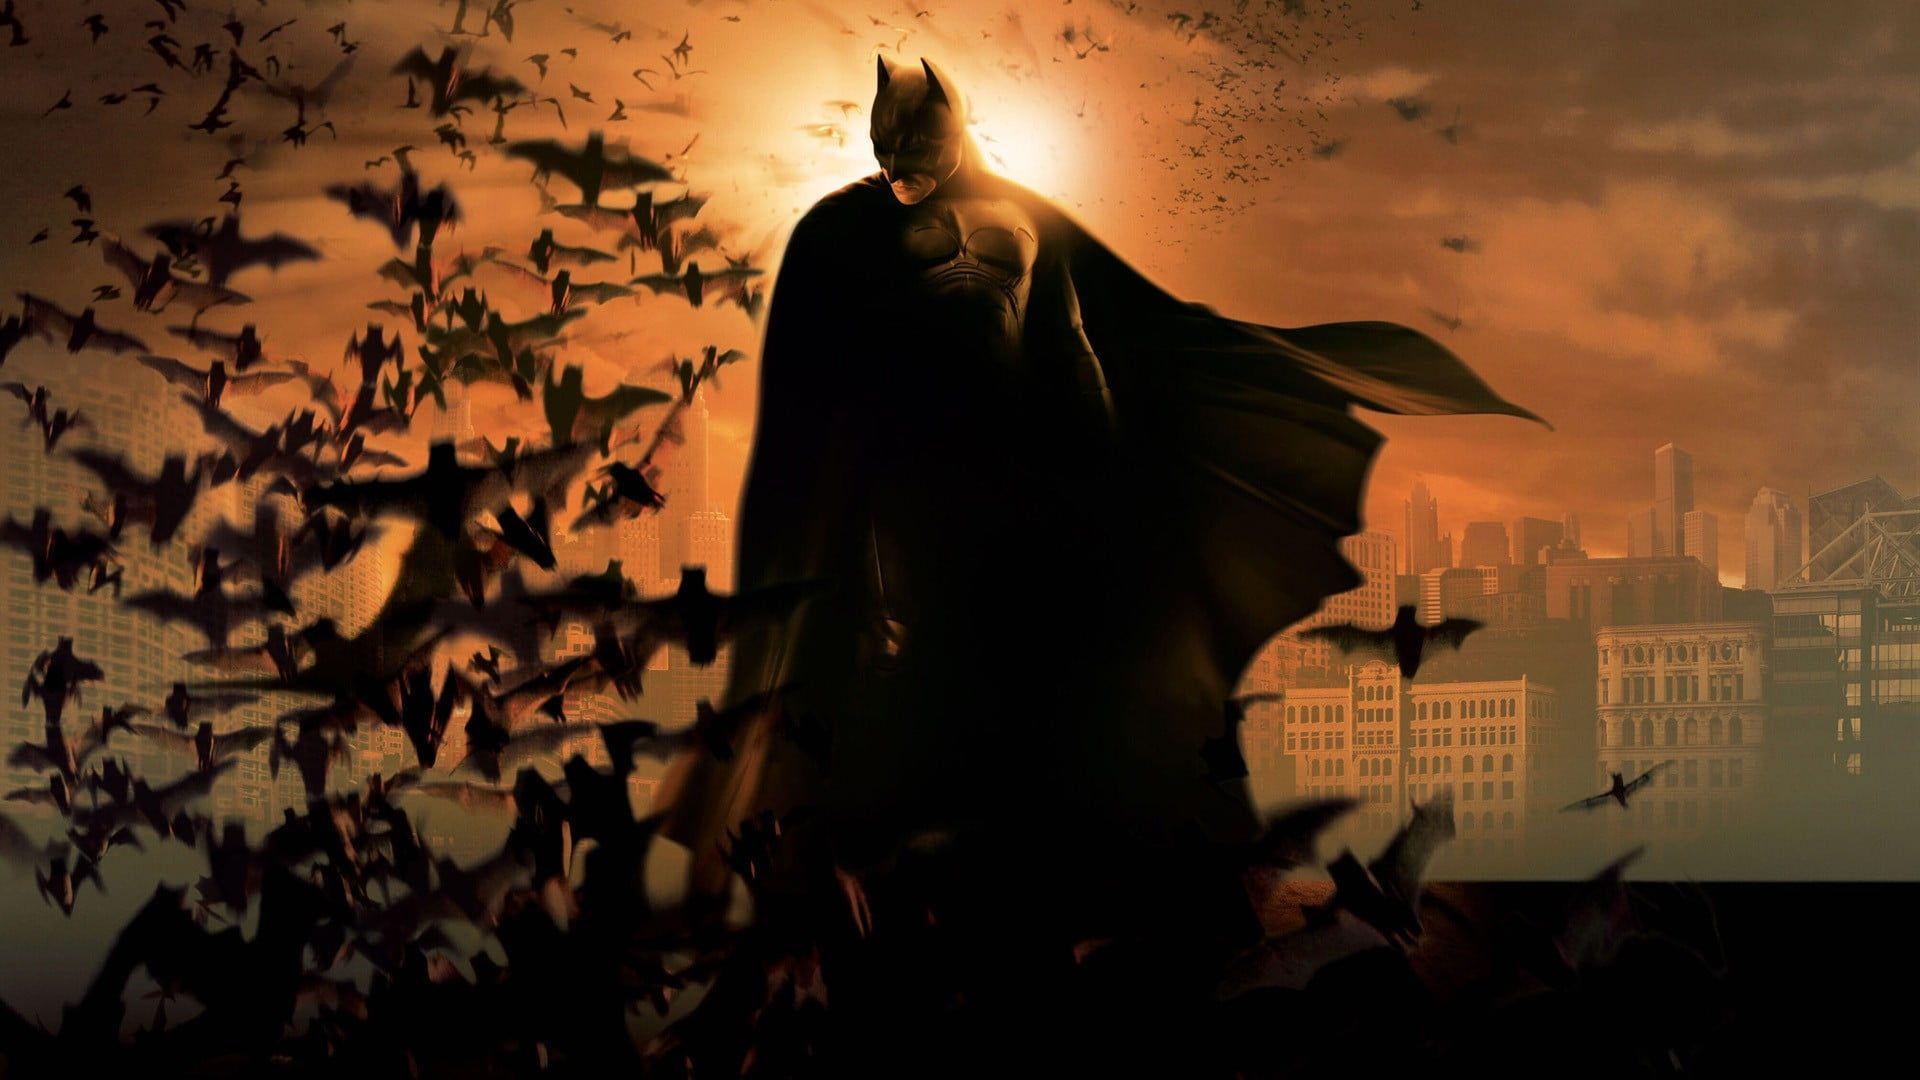 Batman Movies Batman The Dark Knight Batman Begins 1080p Wallpaper Hdwallpaper Desktop In 2020 Batman Hd Wallpaper Marvel Wallpaper